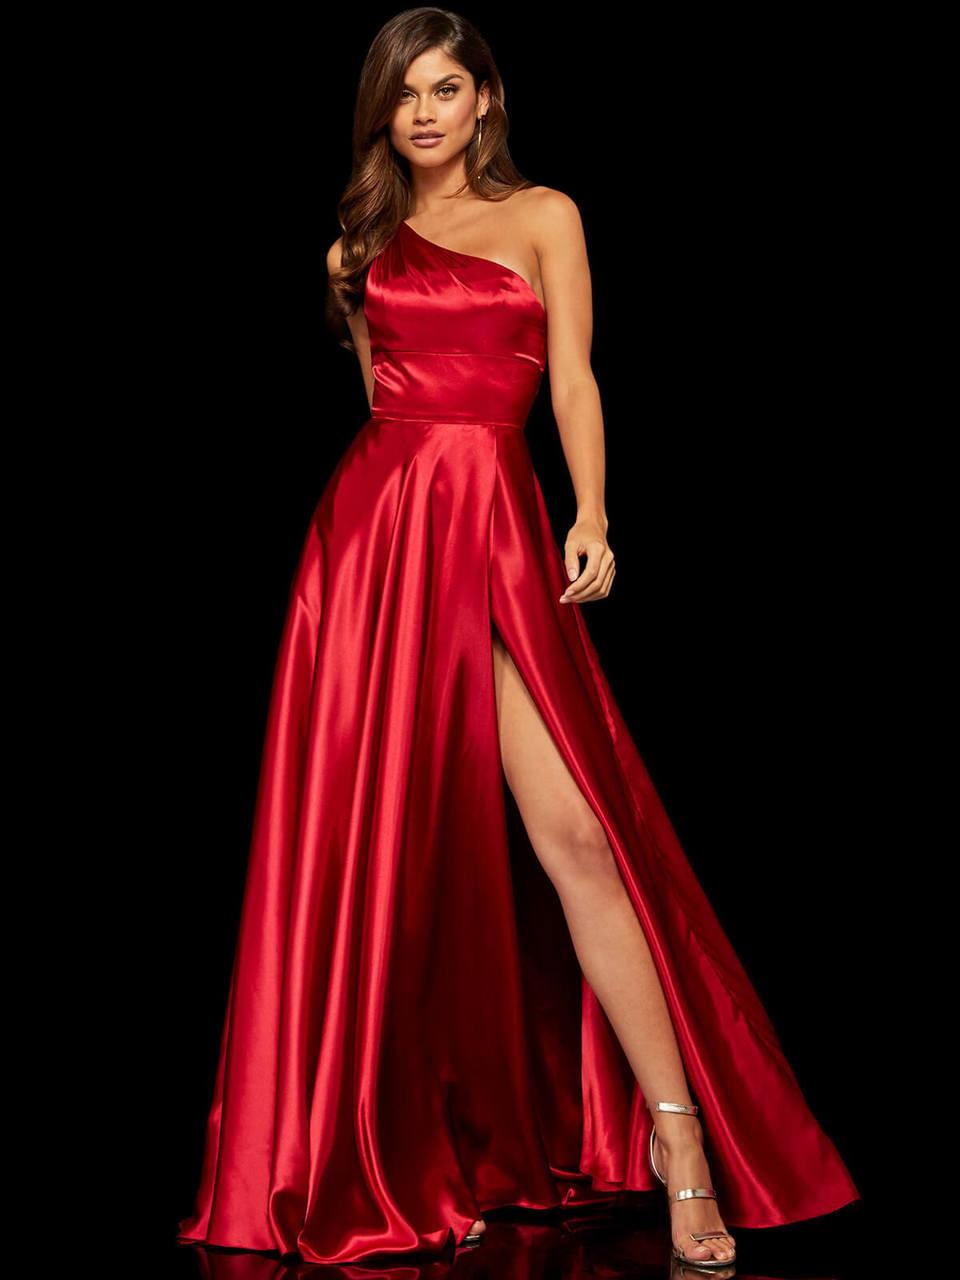 a29089ebc3 One Shoulder A-line Sherri Hill Prom Dress 52750 - PromHeadquarters.com